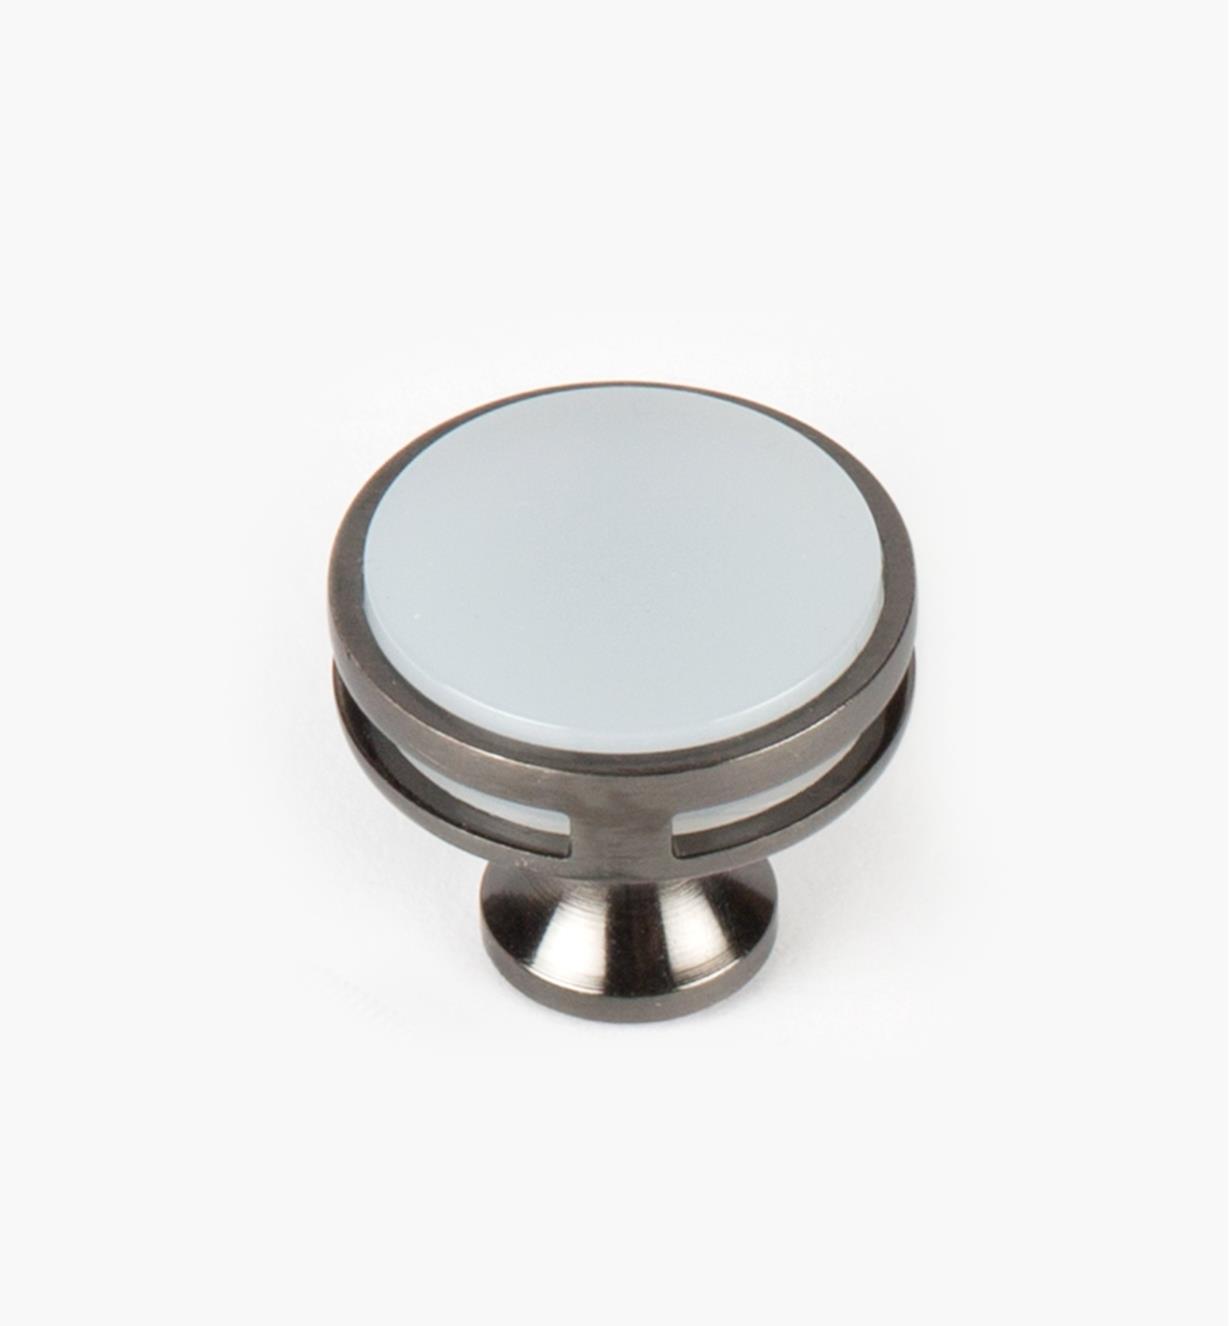 "02A1466 - Oberon Gunmetal / Acrylic 1 3/8"" Knob, each"